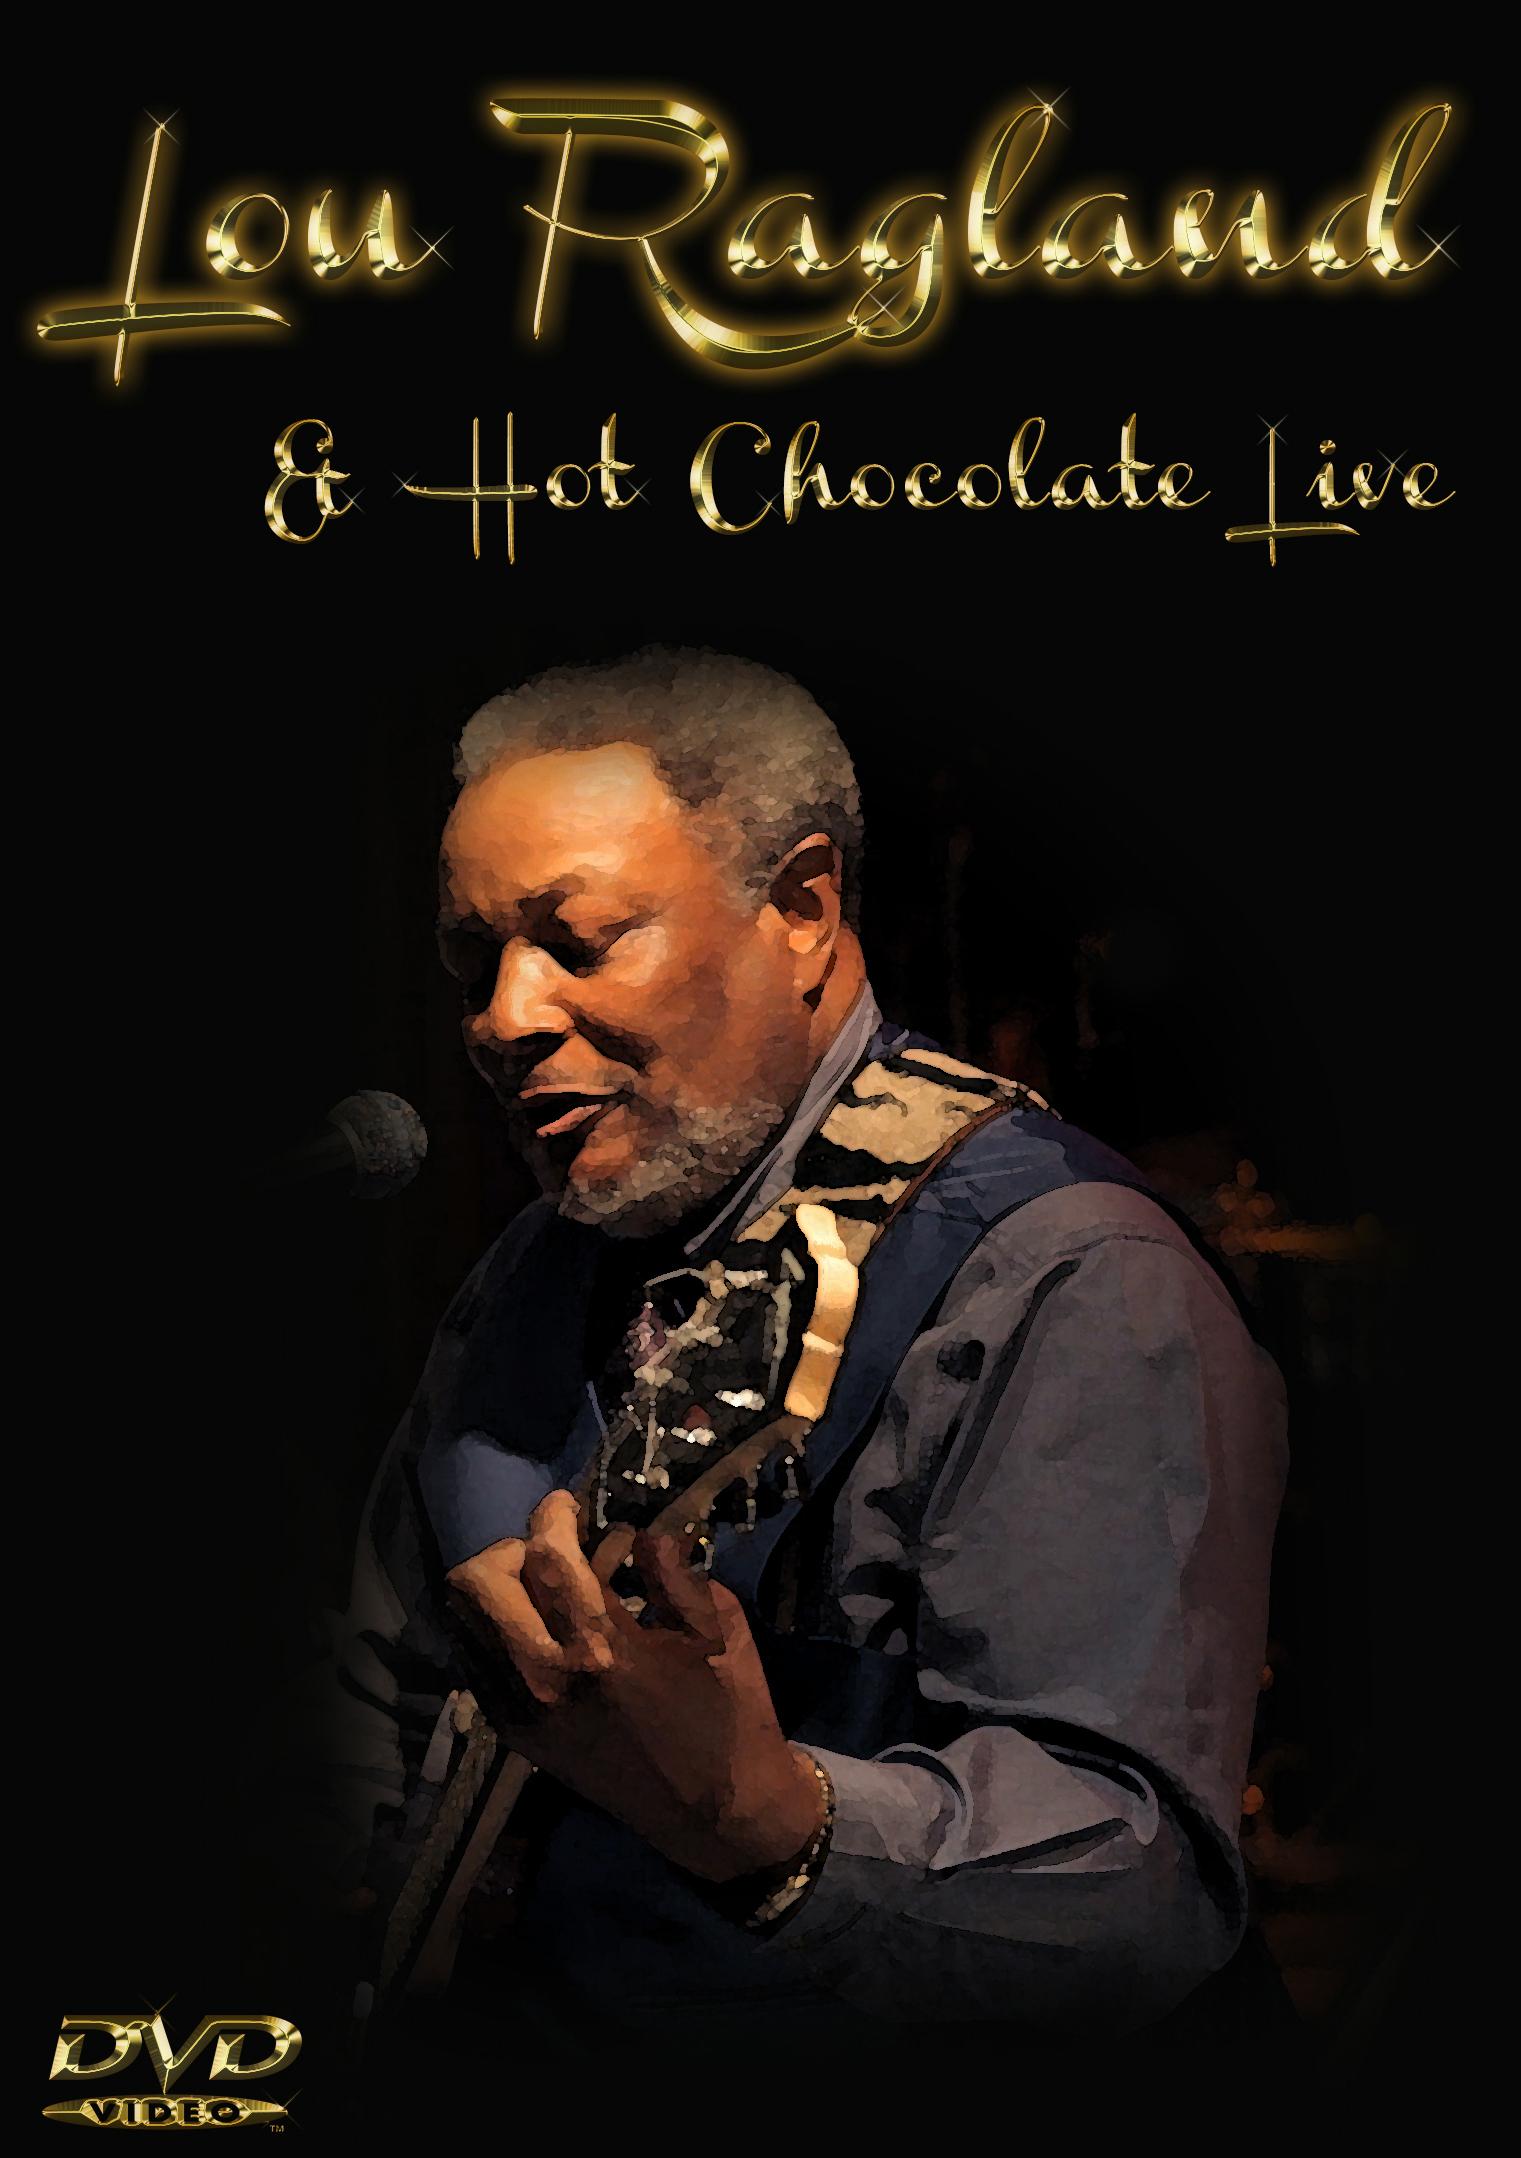 Lou Ragland & Hot Chocolate: Live